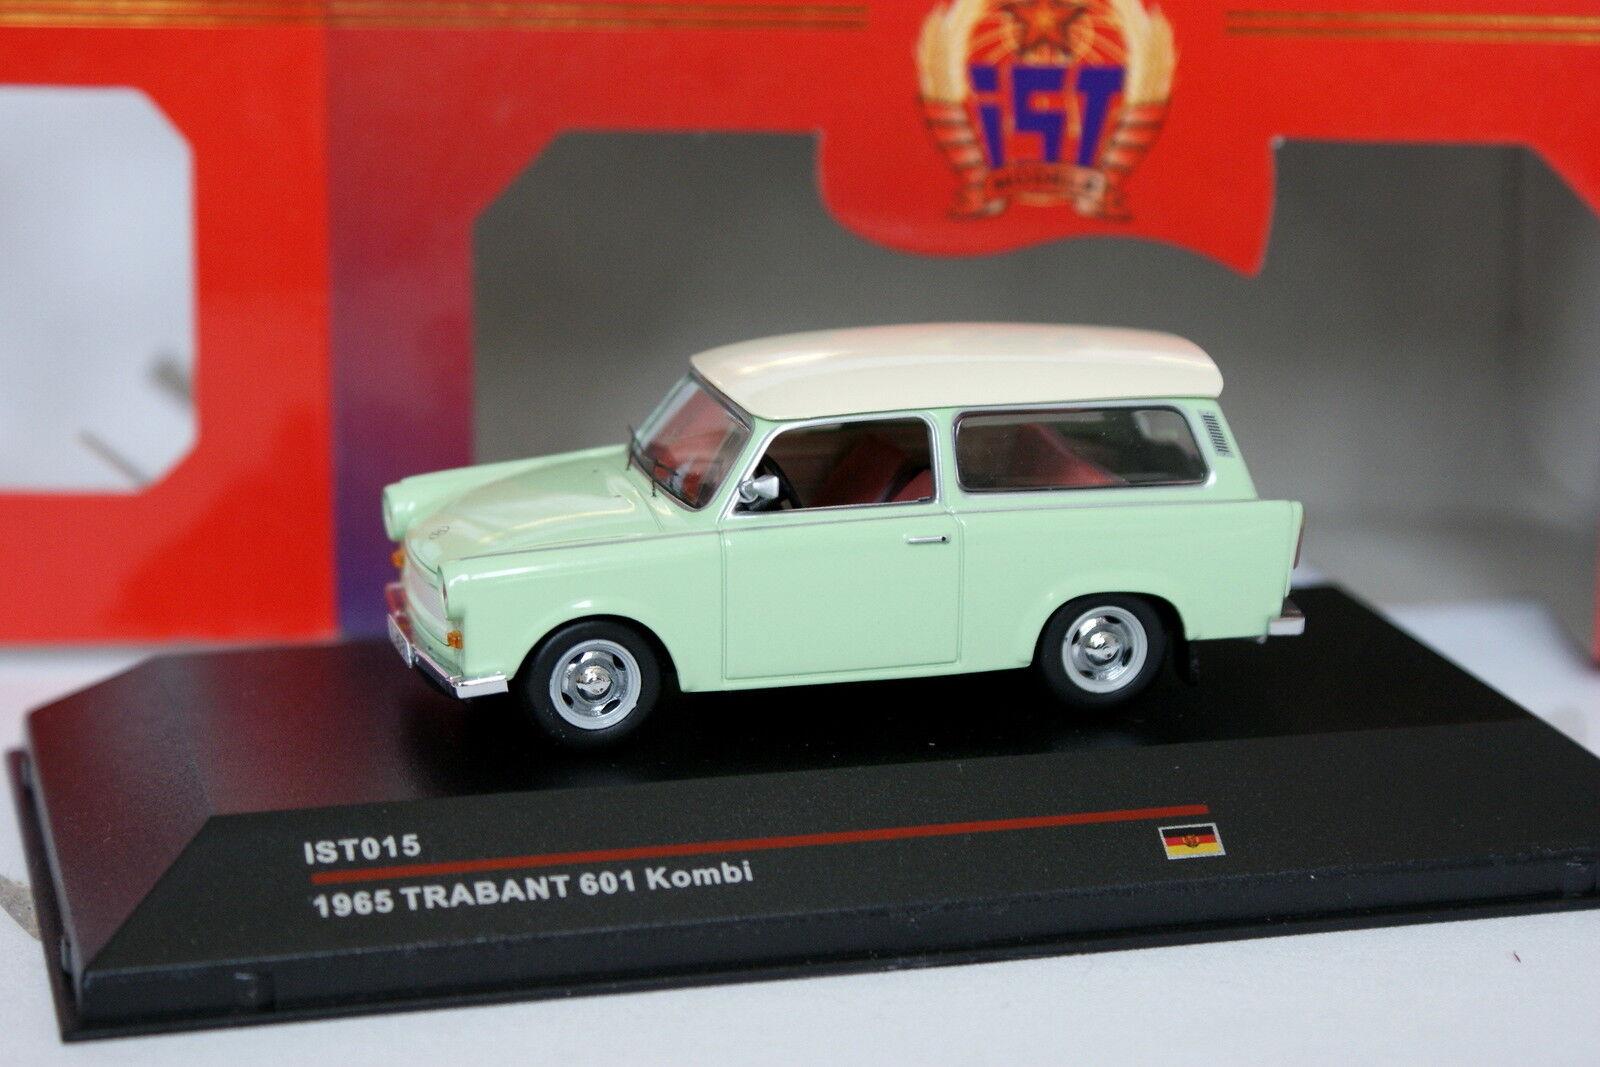 IST 1 43 - Trabant 601 Kombi 1965 1965 1965 22f3ba